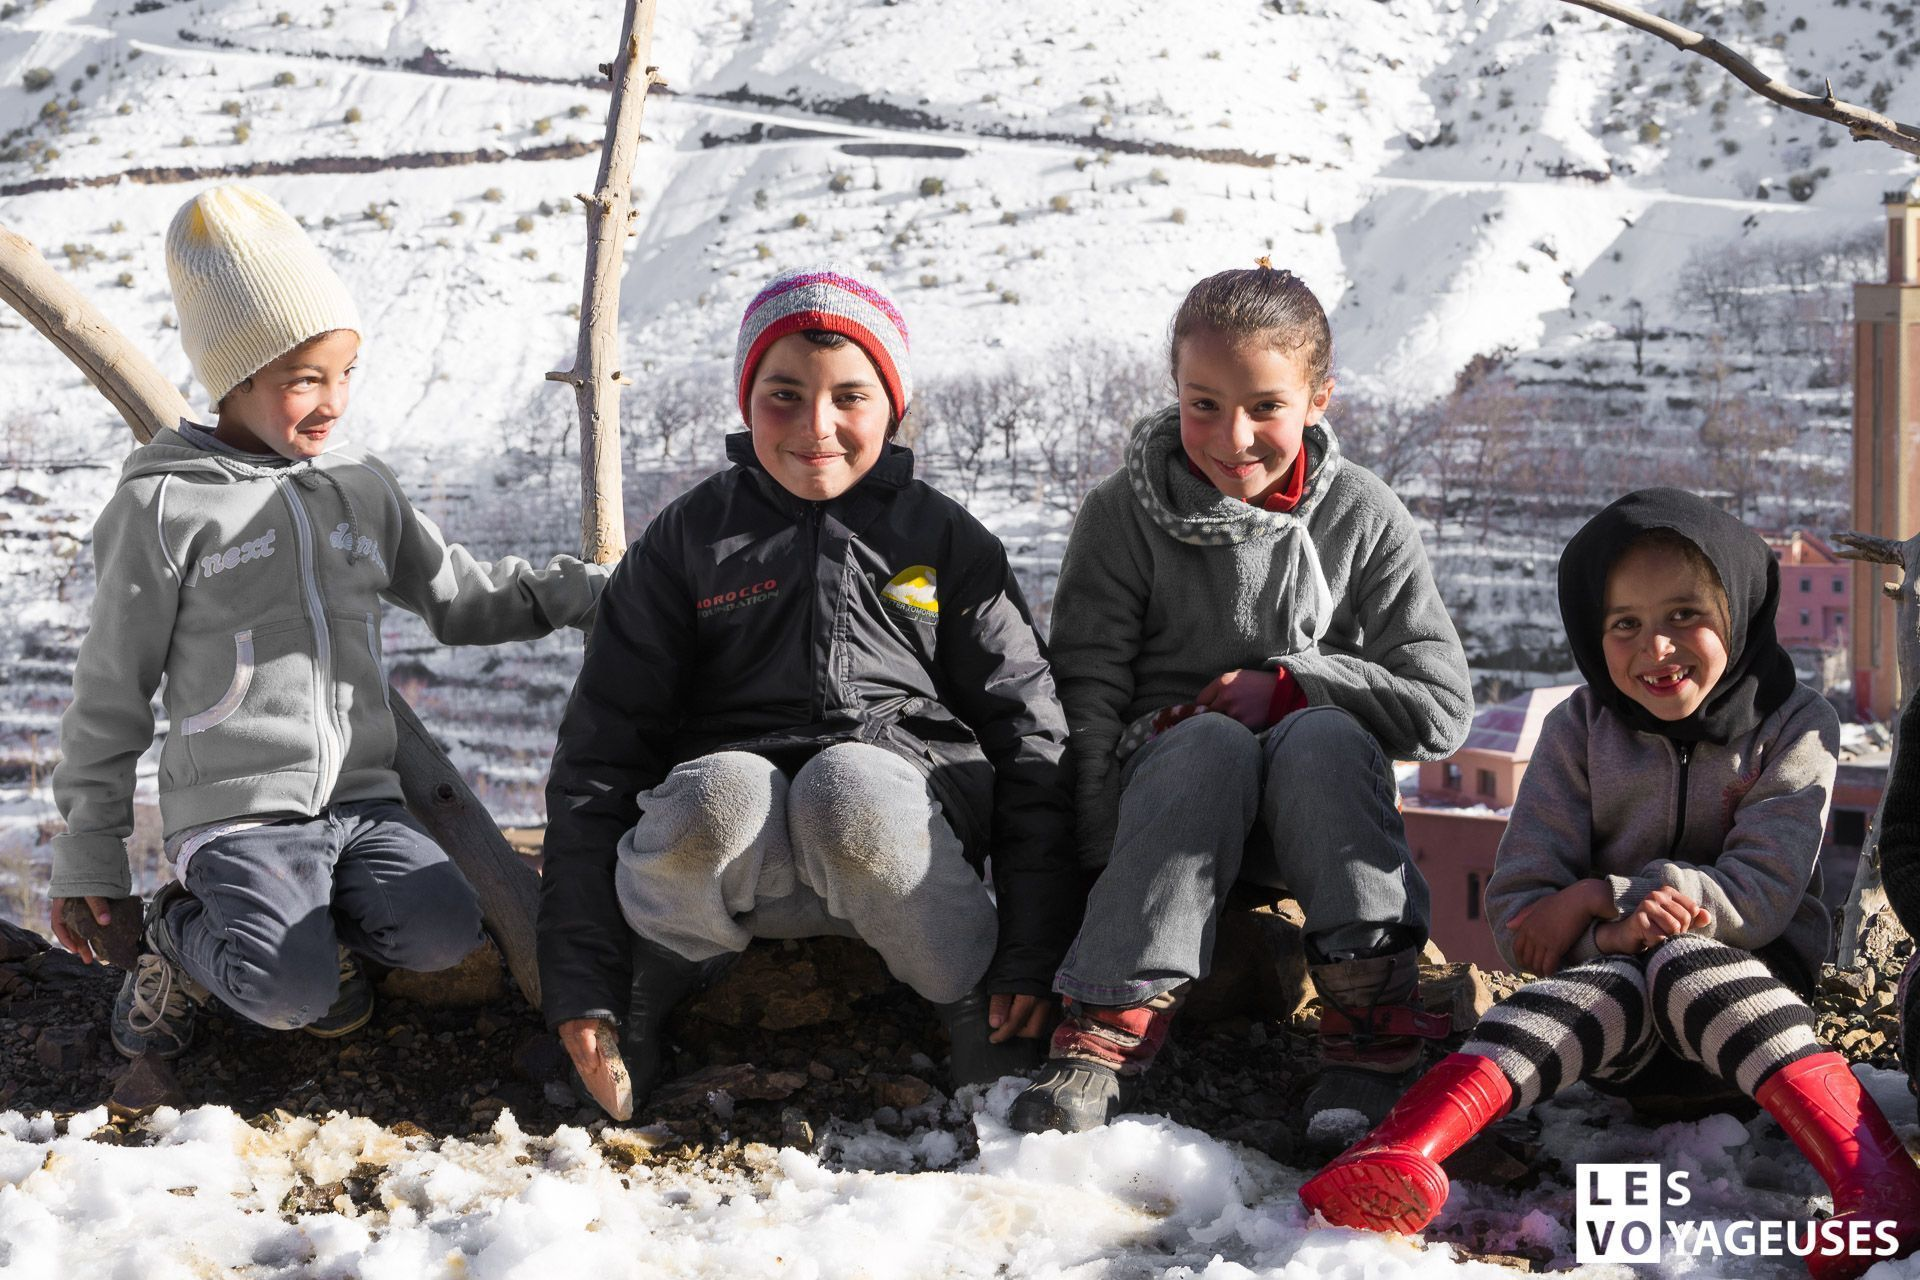 Les-voyageuses-maroc-imlil-hiver-00046